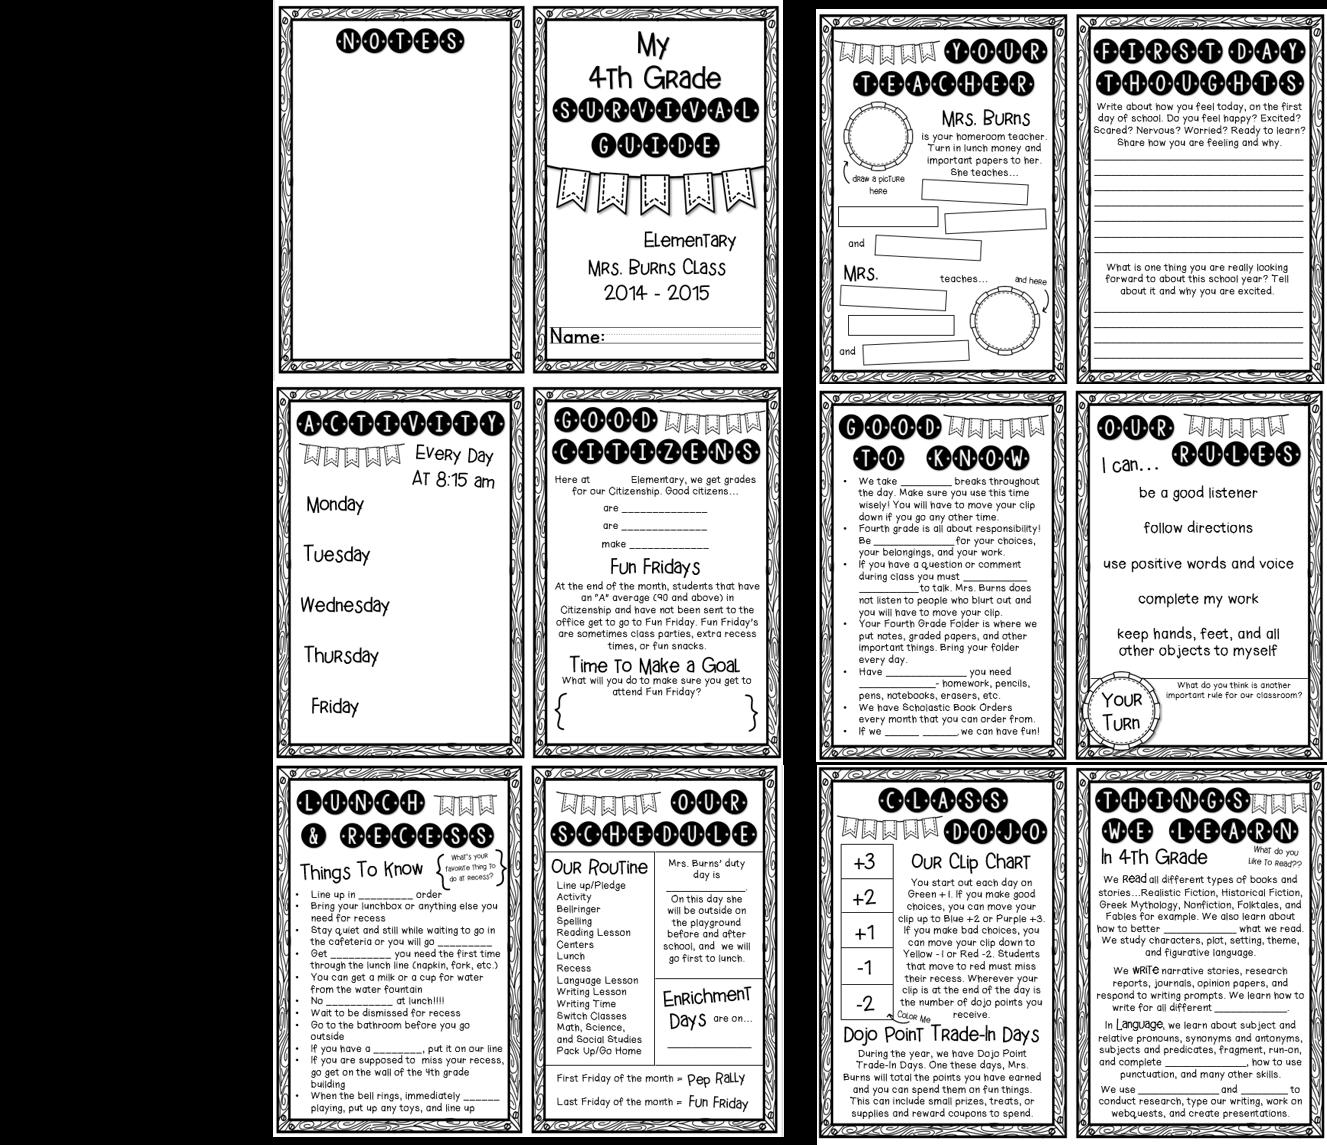 http://www.teacherspayteachers.com/Product/Back-to-School-Survival-Guide-Editable-1275114